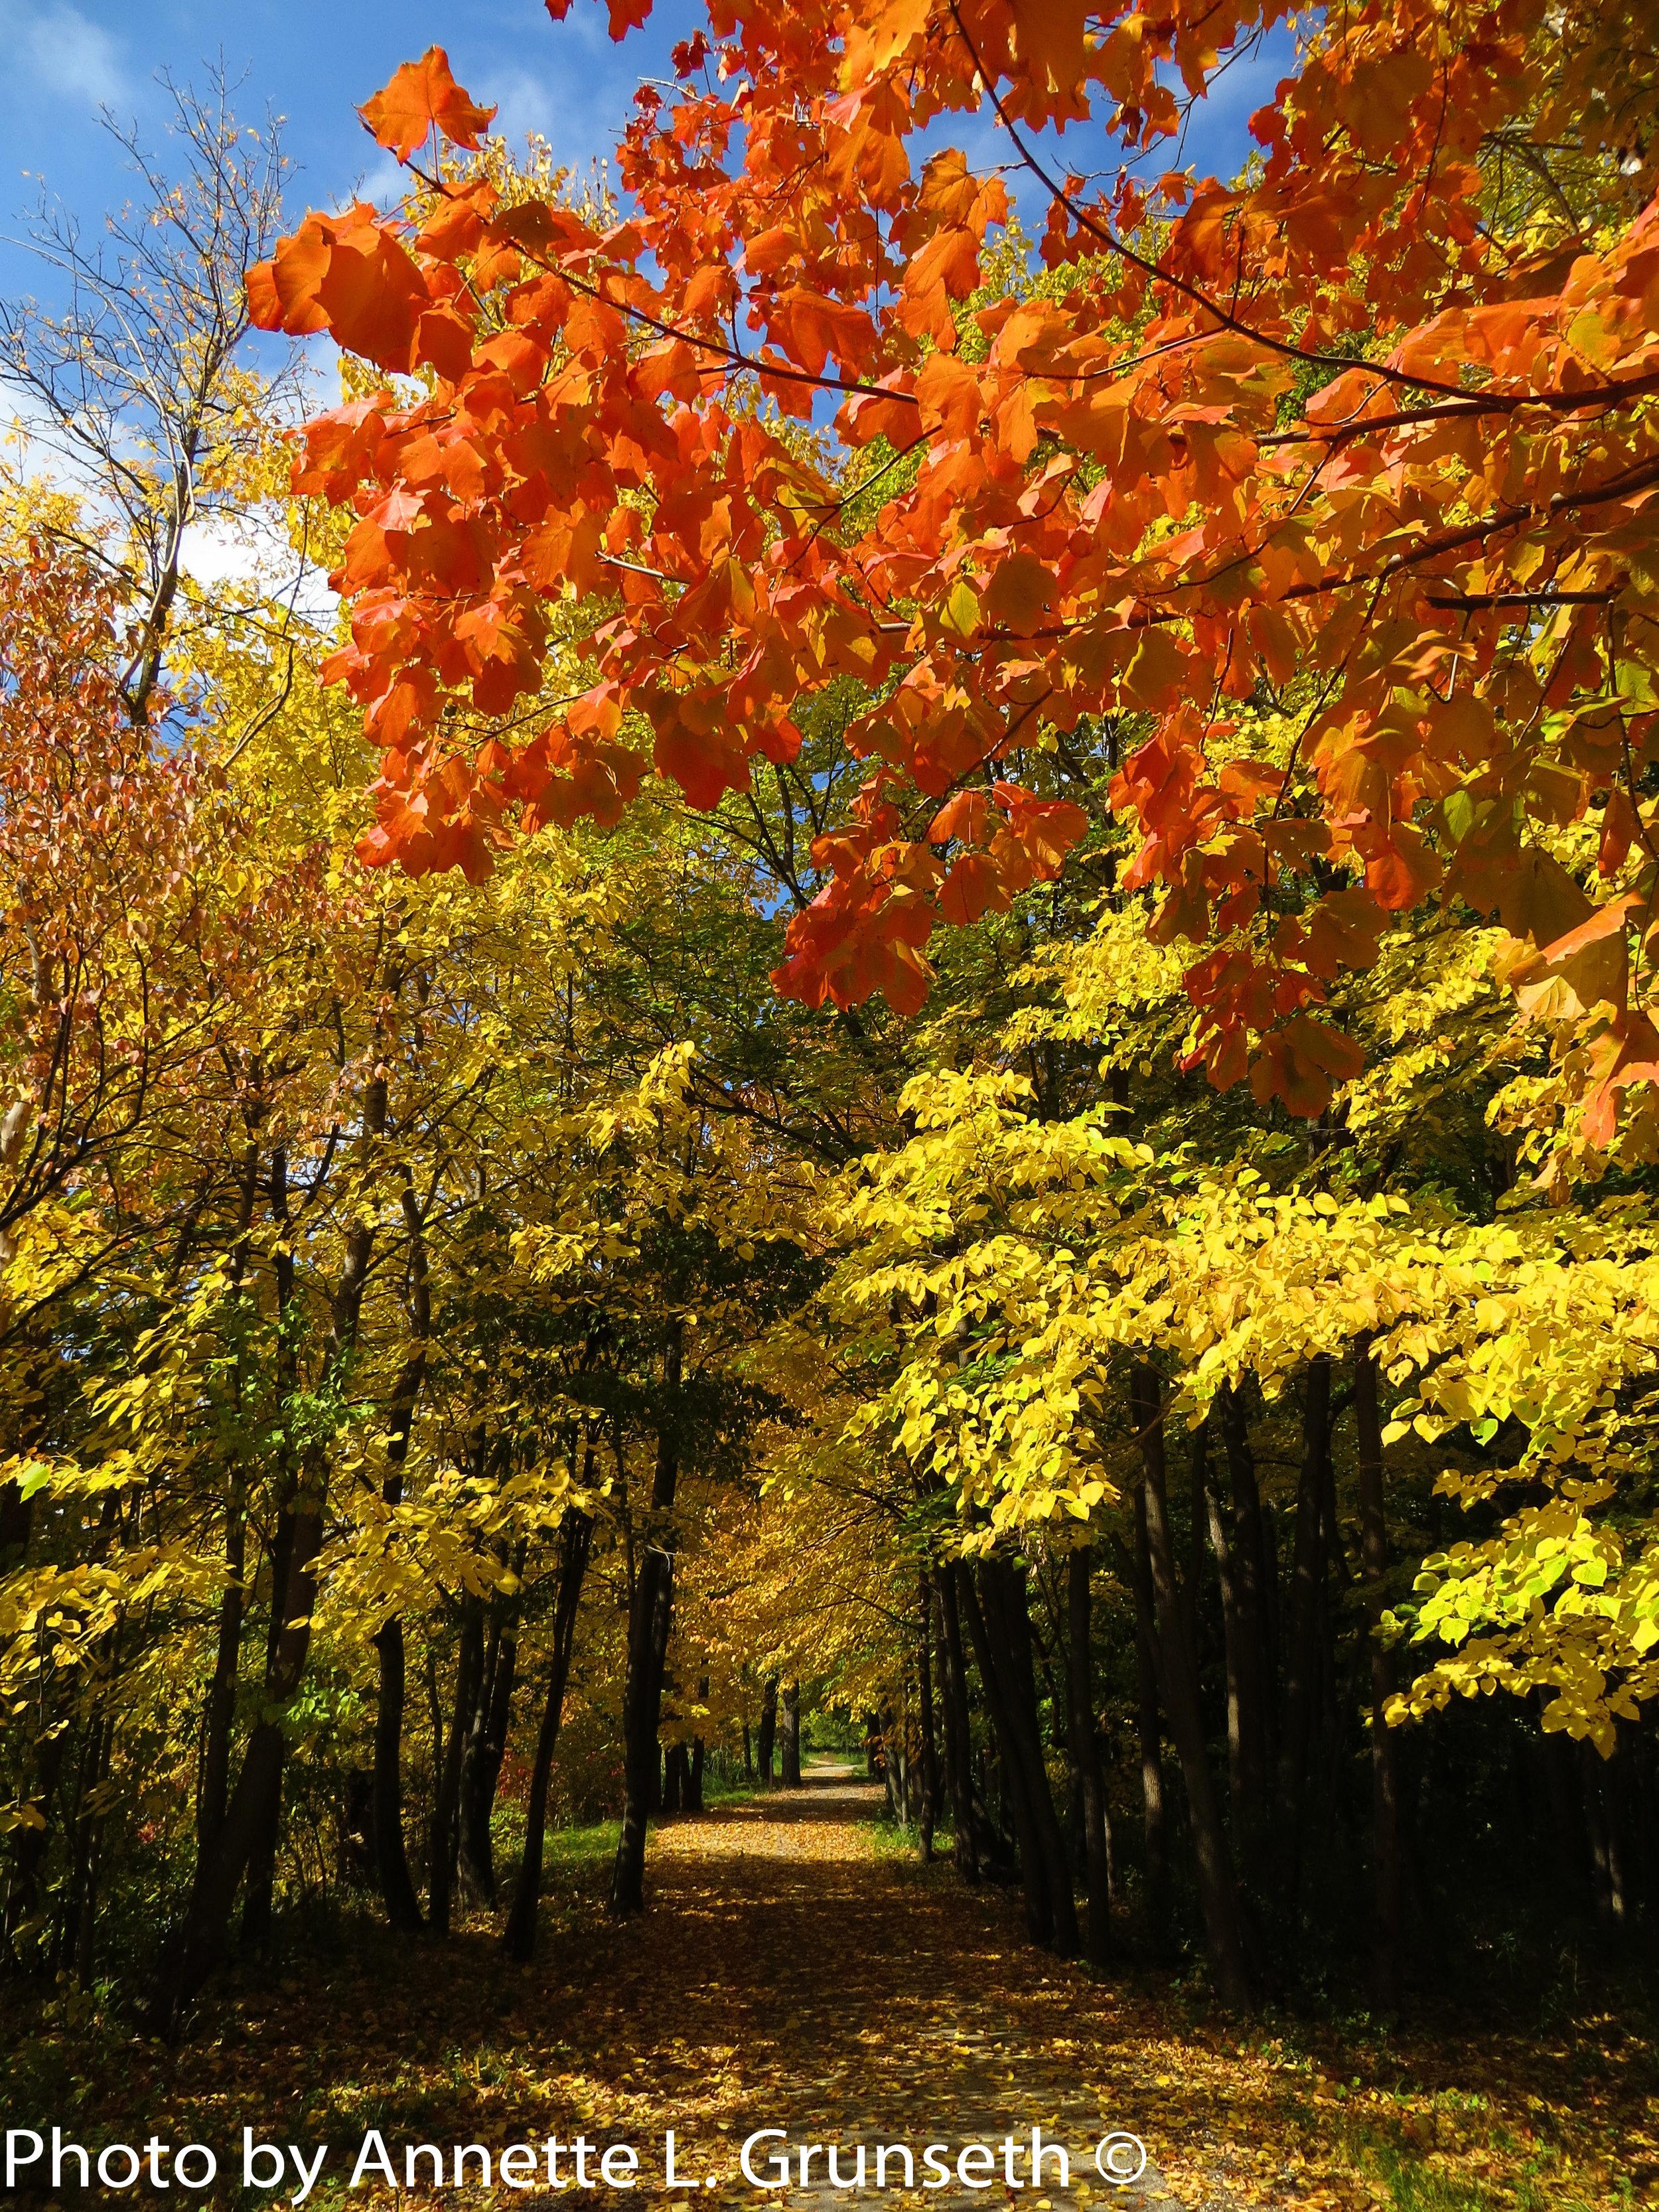 Grunseth-Allouez-East RiverBike Trail.jpg